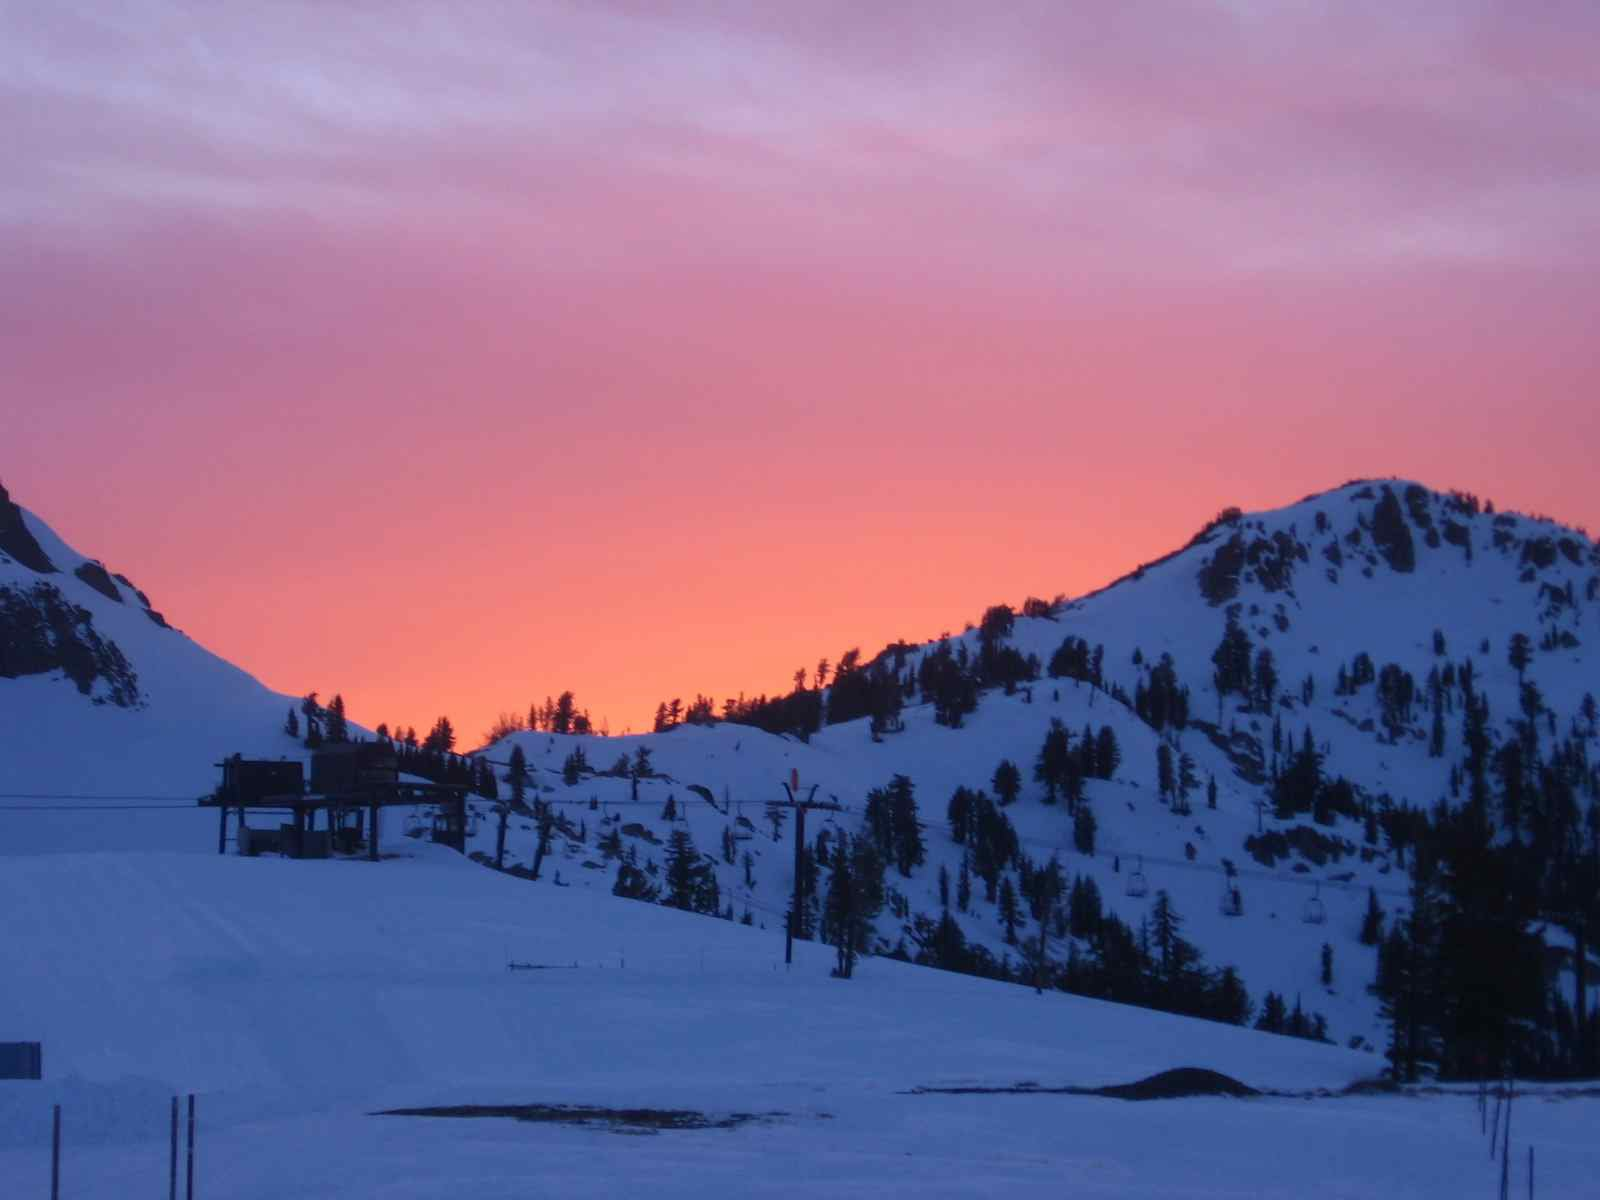 Sunset at High Camp